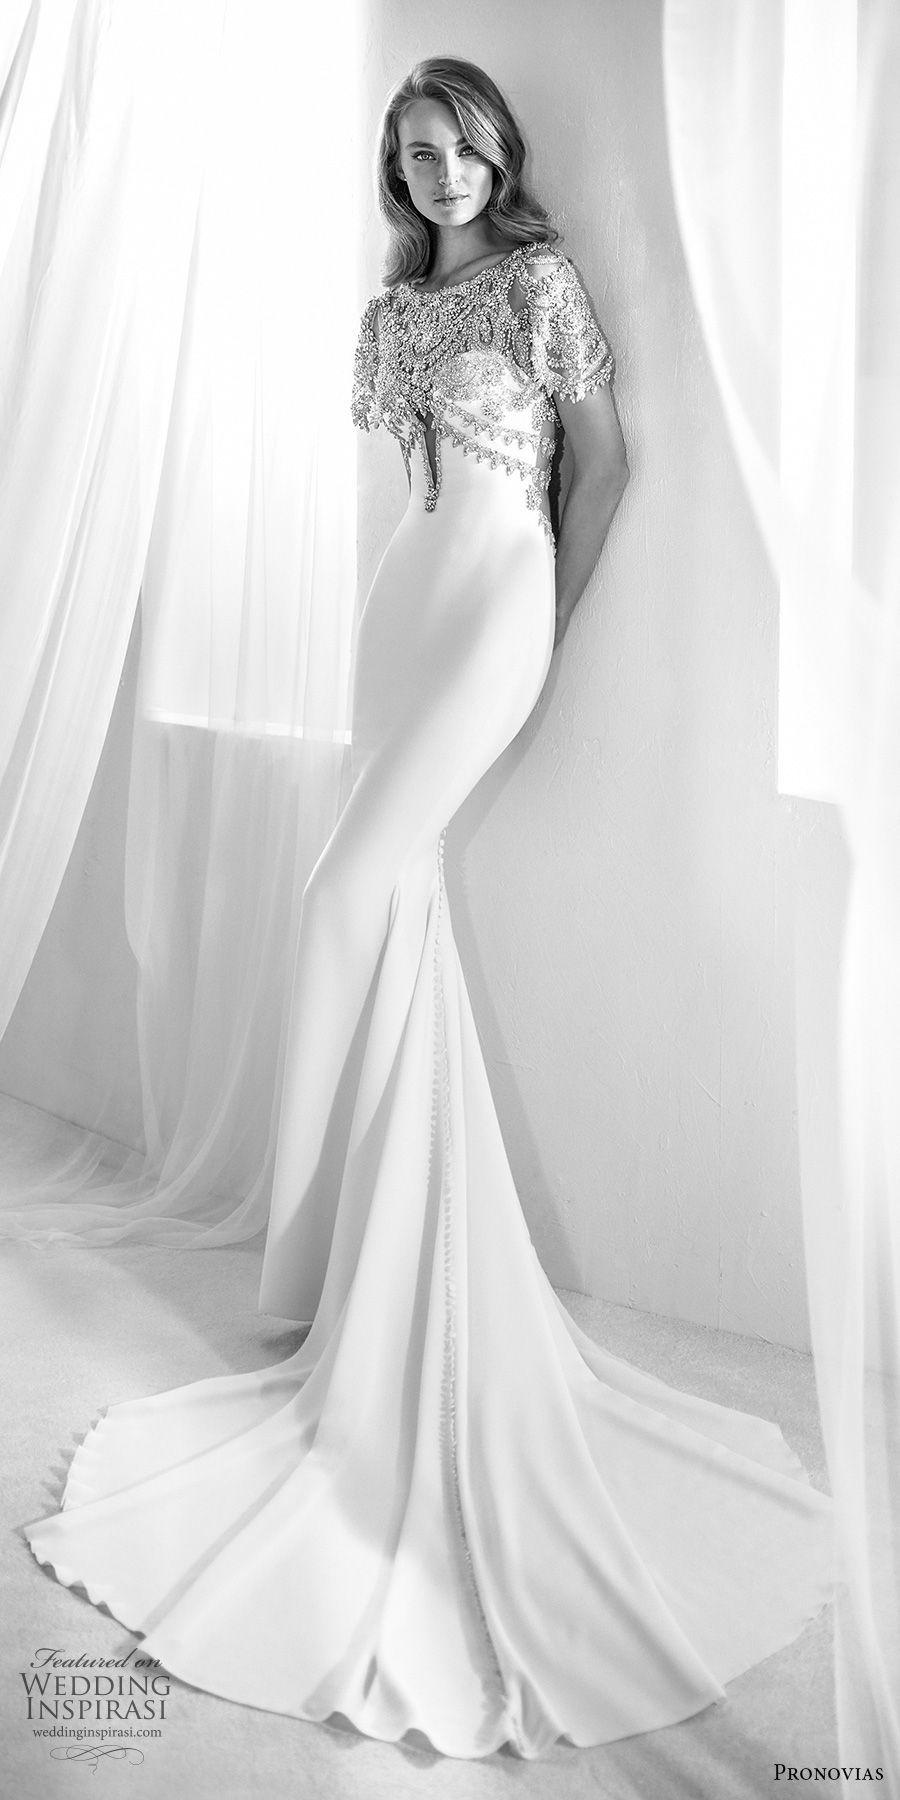 Atelier pronovias wedding dresses atelier pronovias